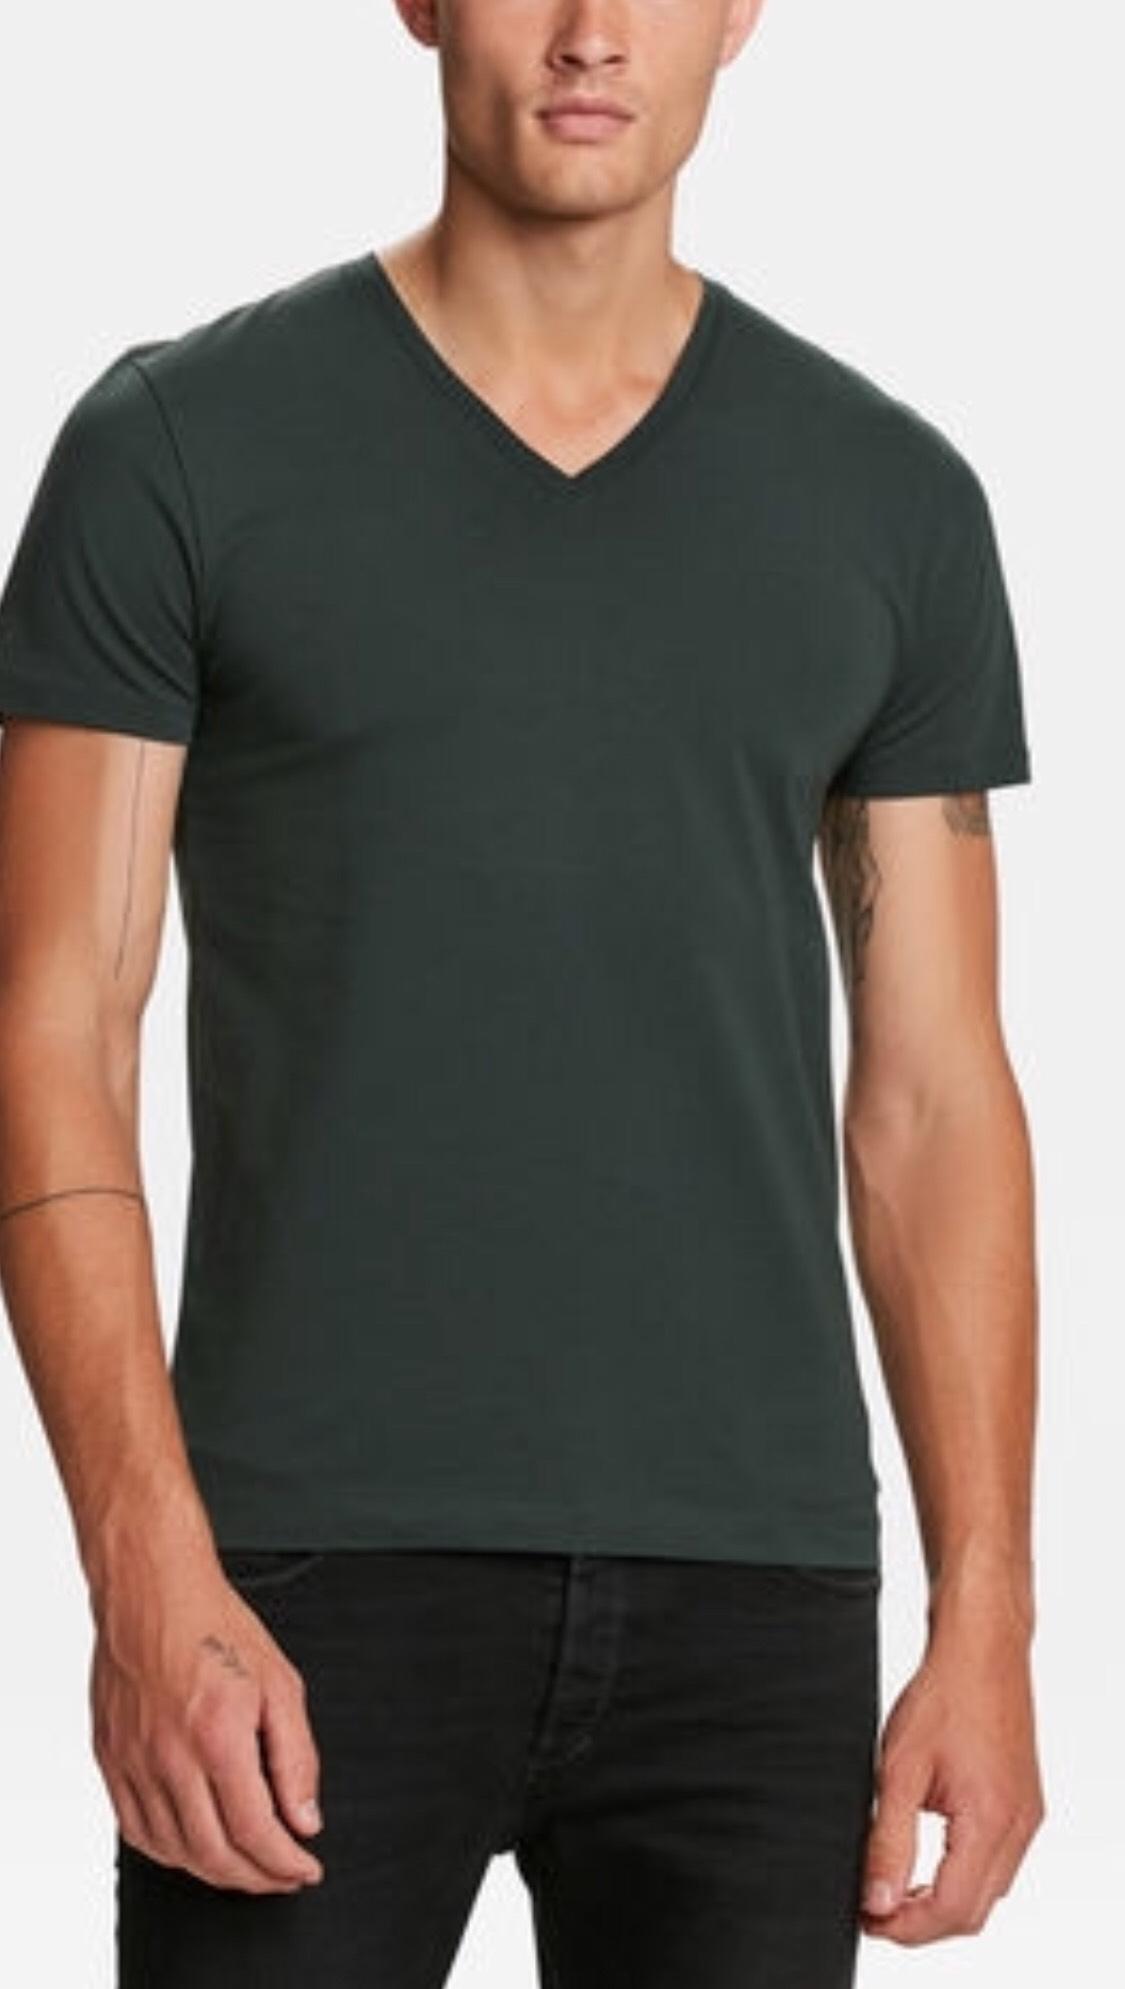 [prijsfout] Heren organisch katoen t-shirt @We Fashion